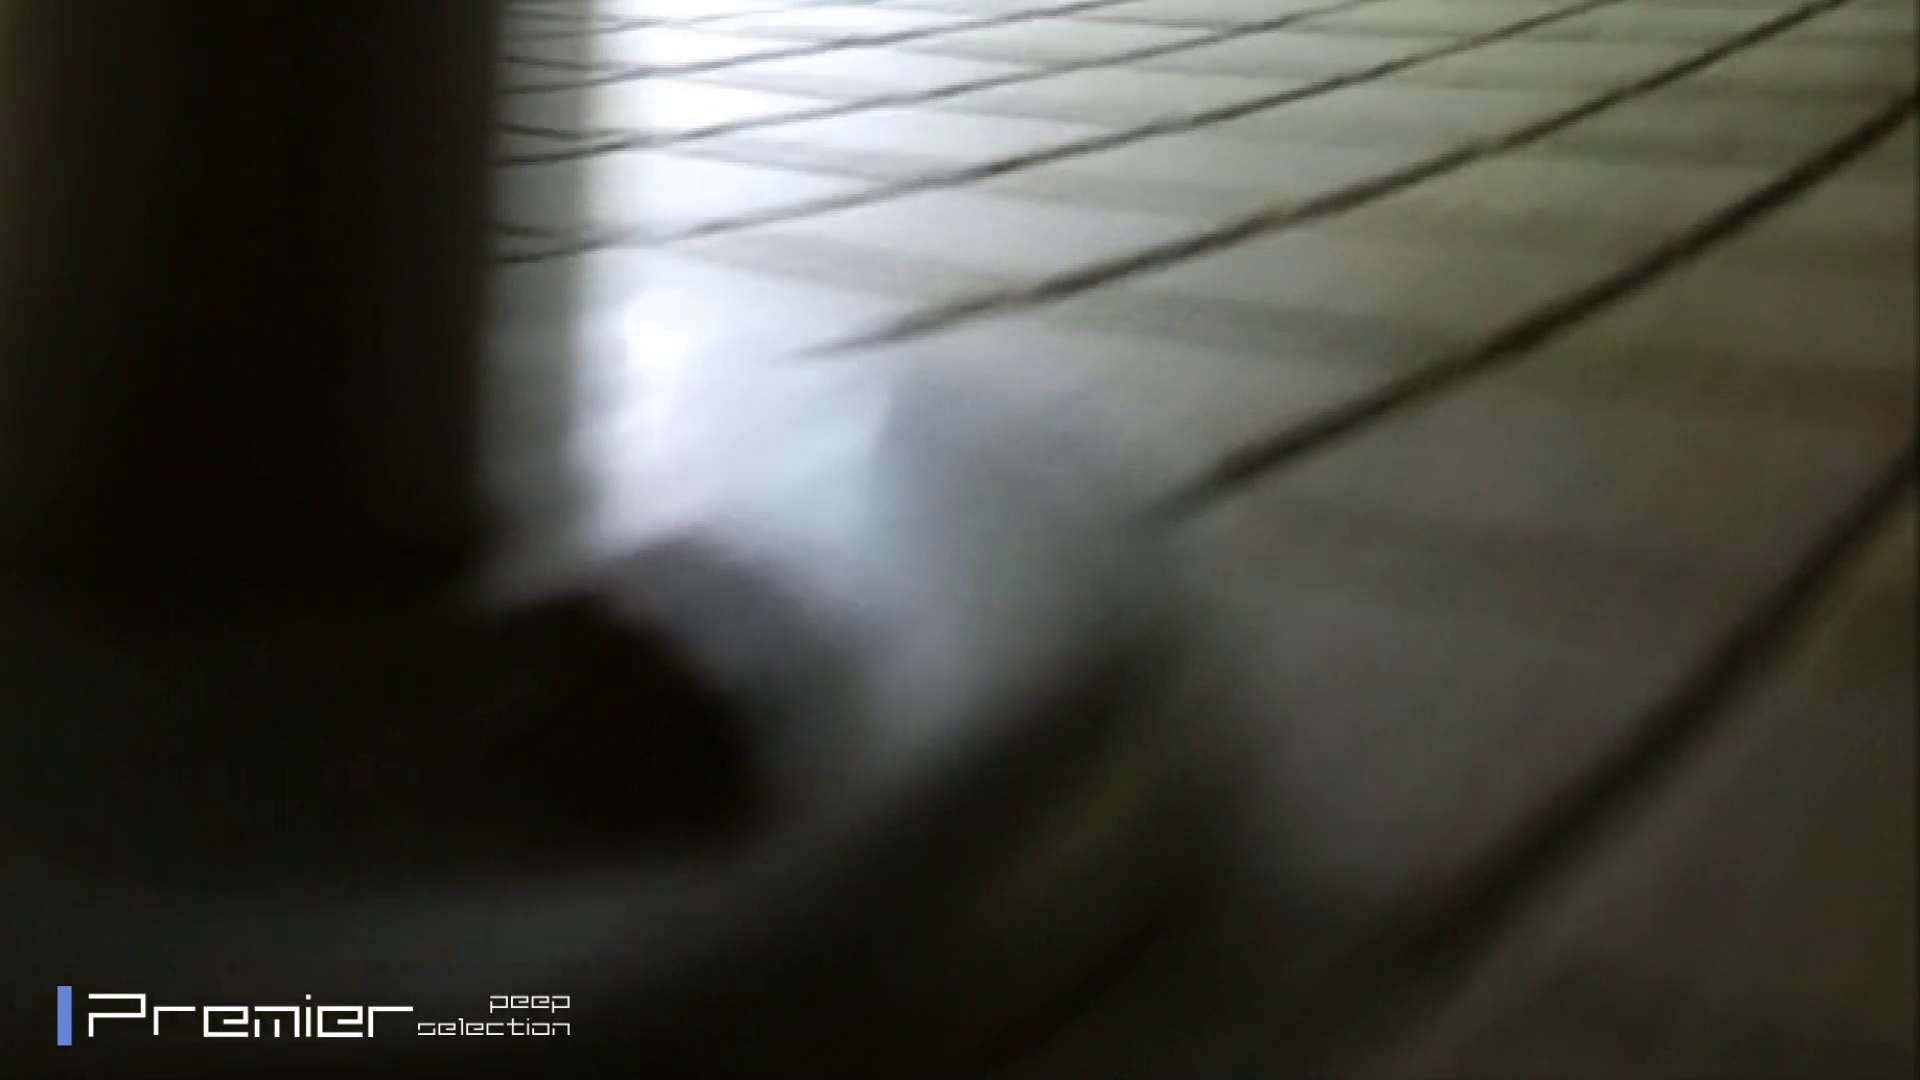 FHD激カワ!激やば! 復讐のトイレ盗撮 Vol.03 名作殿堂  78PIX 15